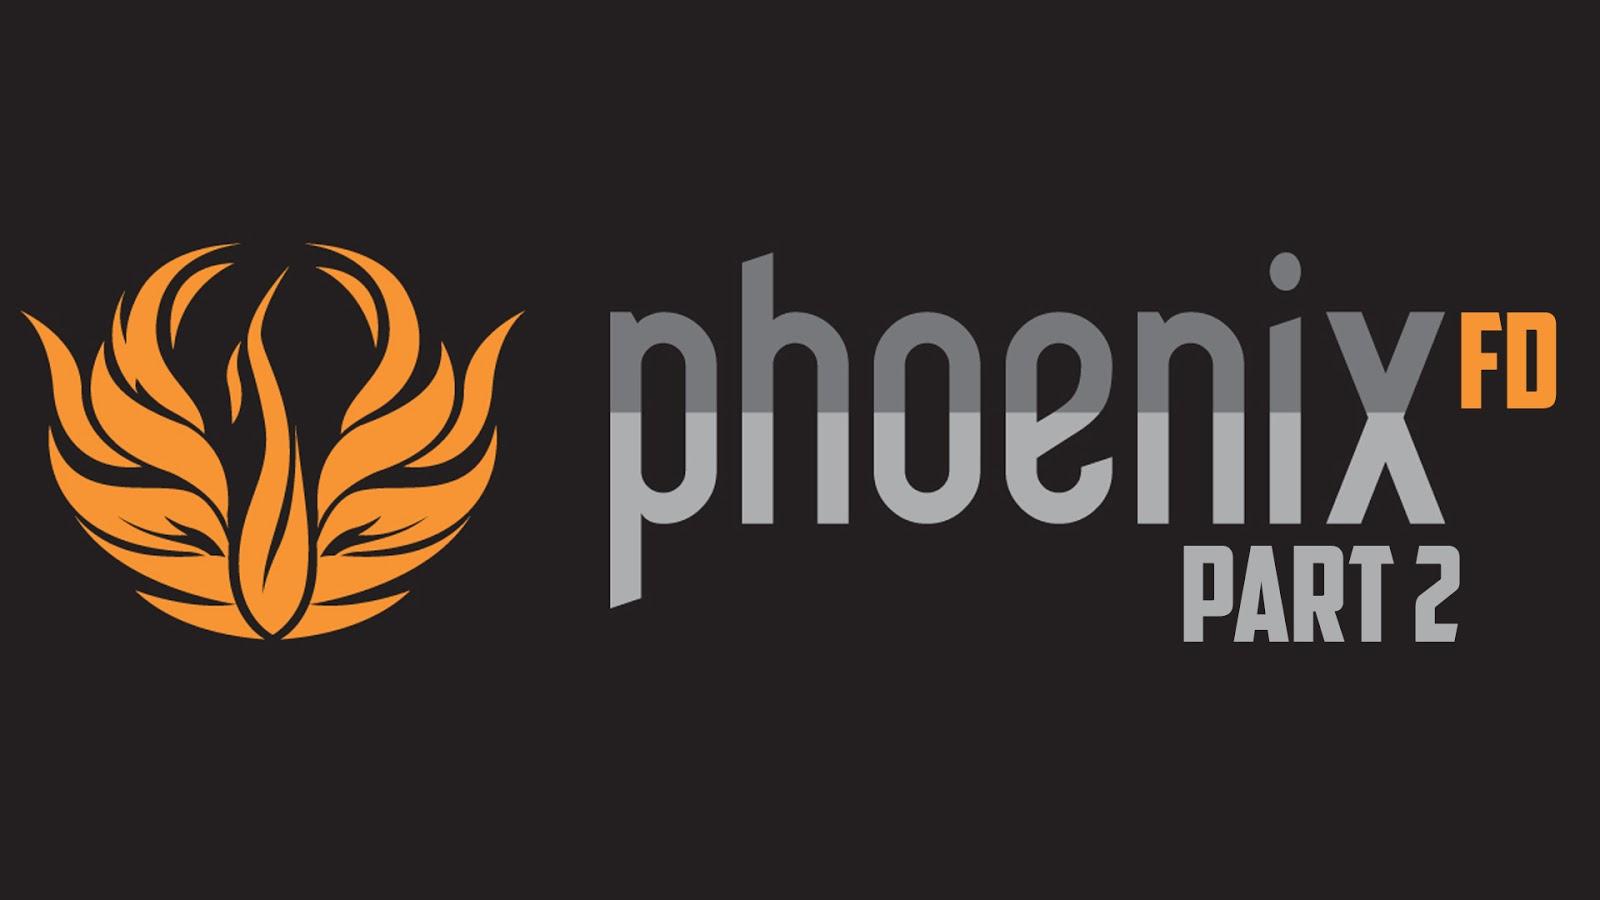 PHOENIXFD_PART_2.jpg